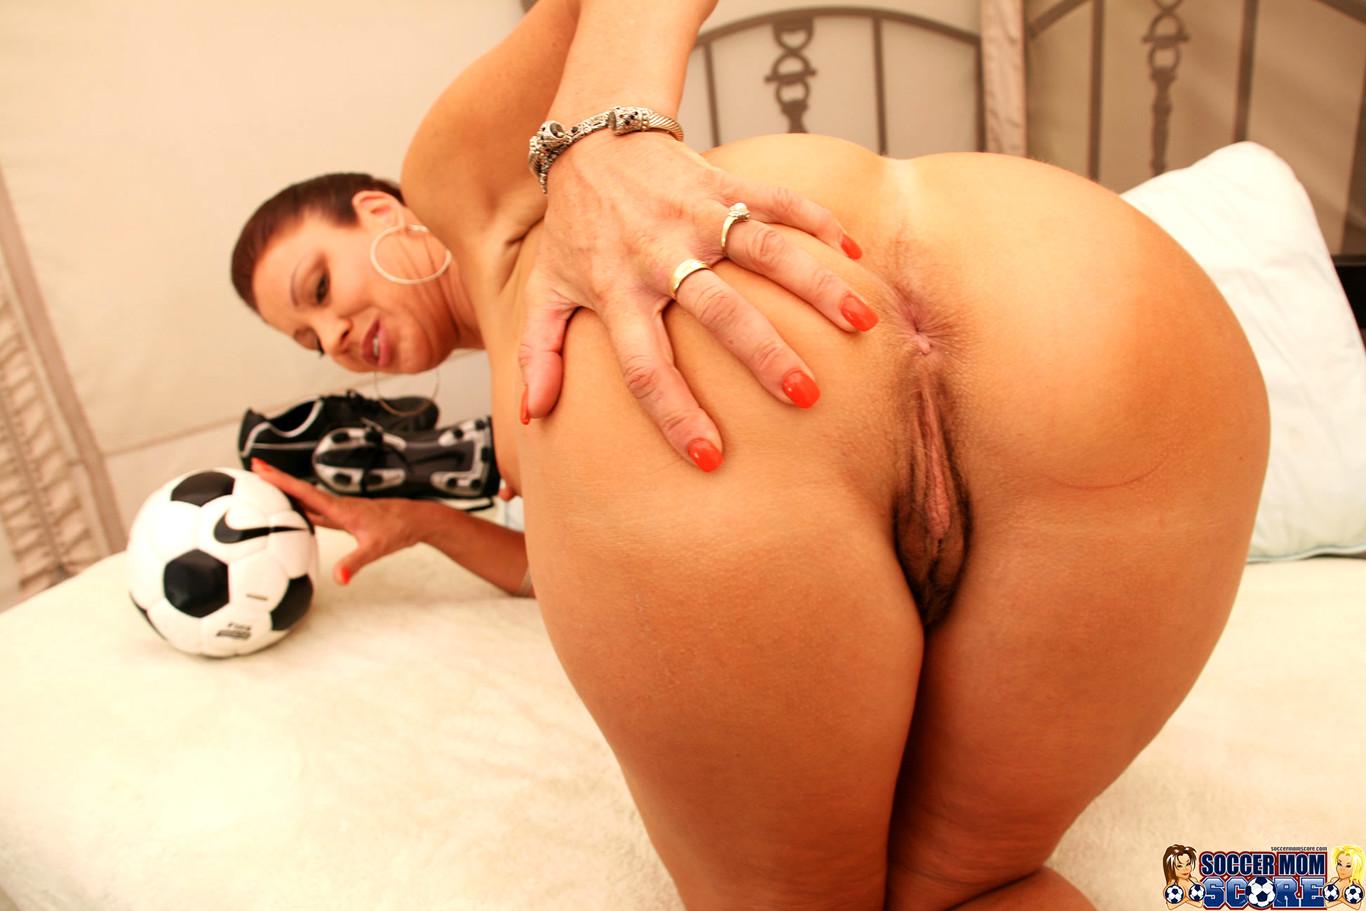 thug-soccer-mom-porn-star-with